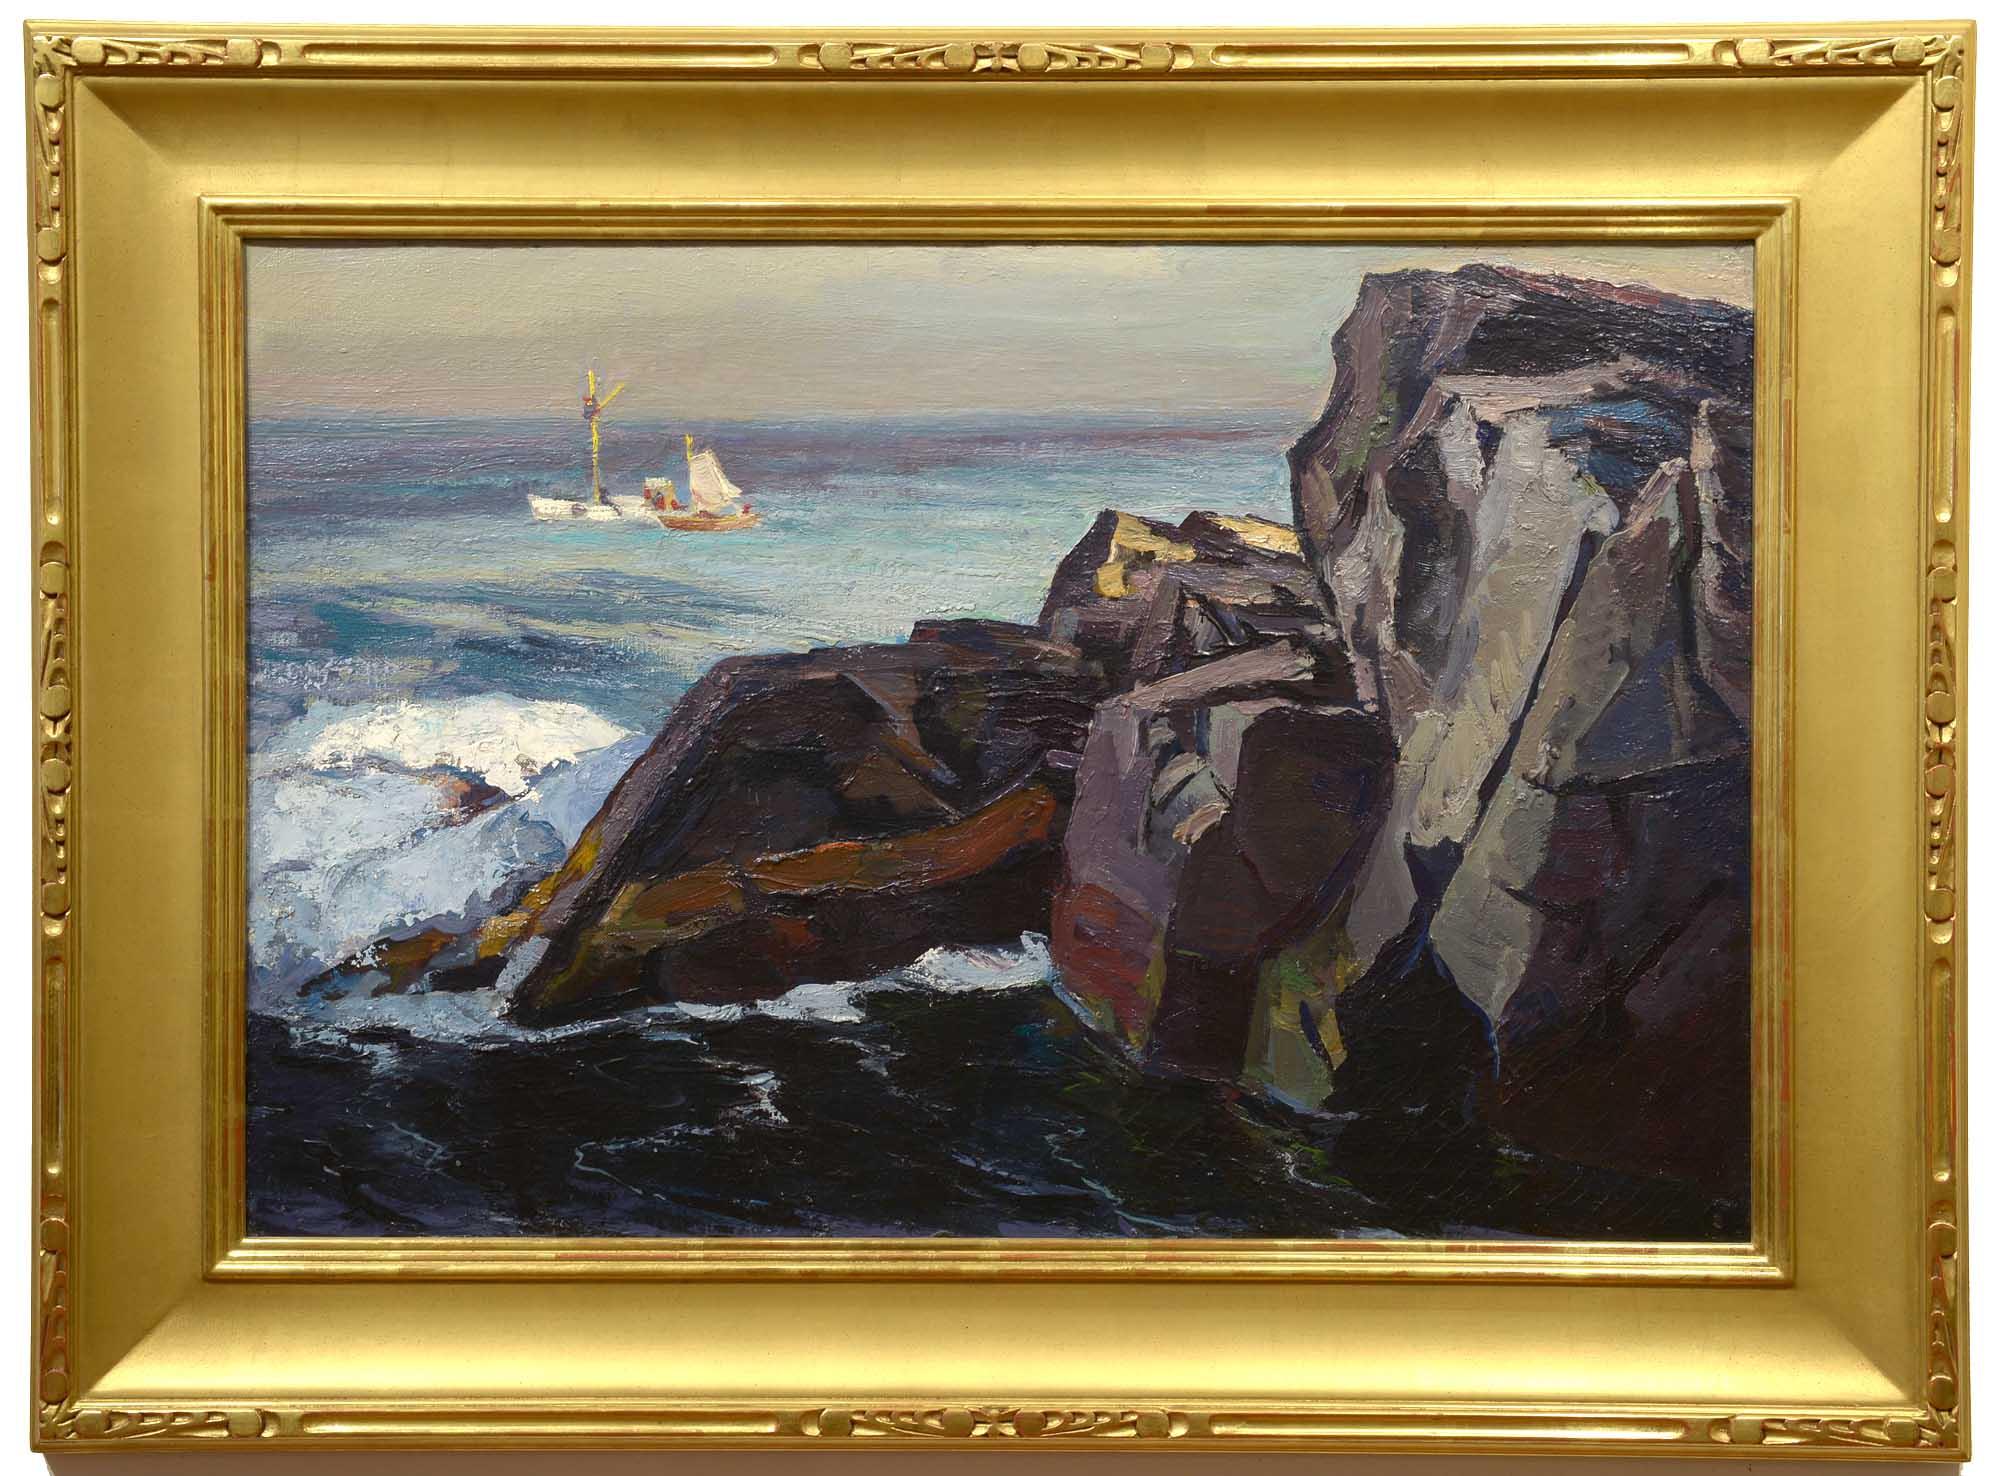 Abraham Bogdanove Fishing Boats off Squeaker Cove framed